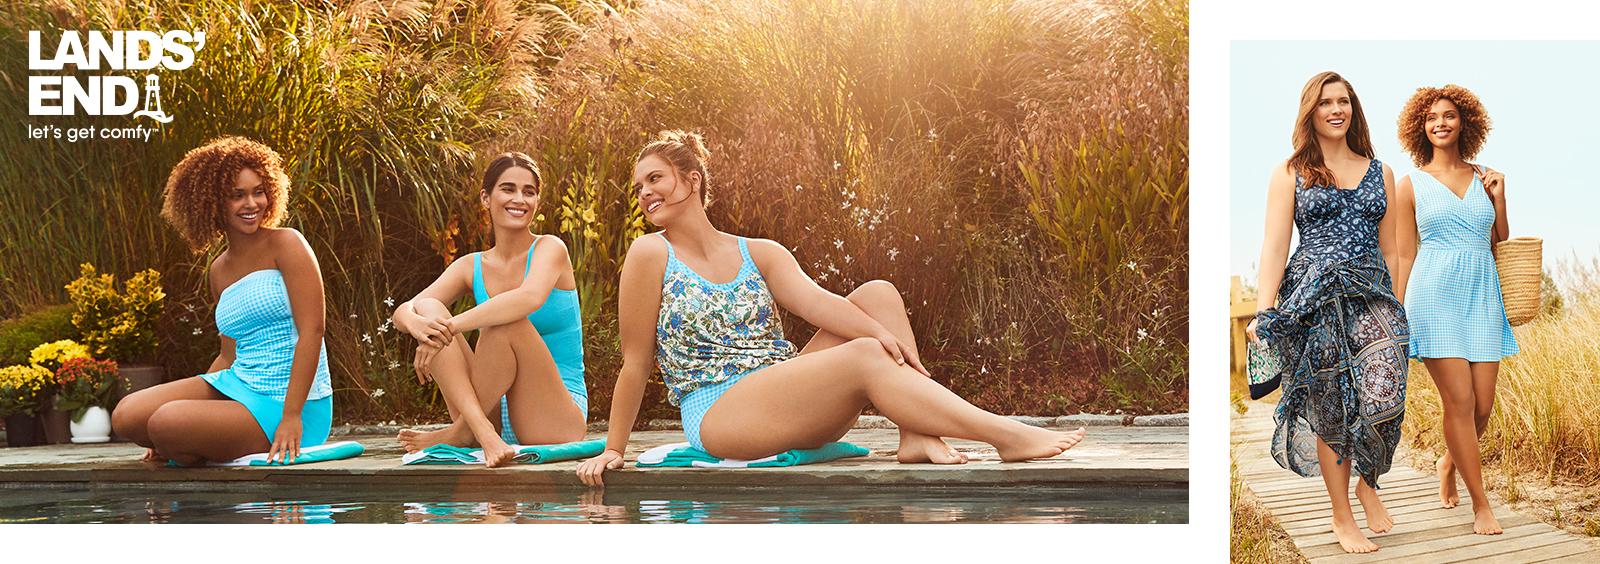 5 Tips for Having Skin-Safe Fun in the Sun